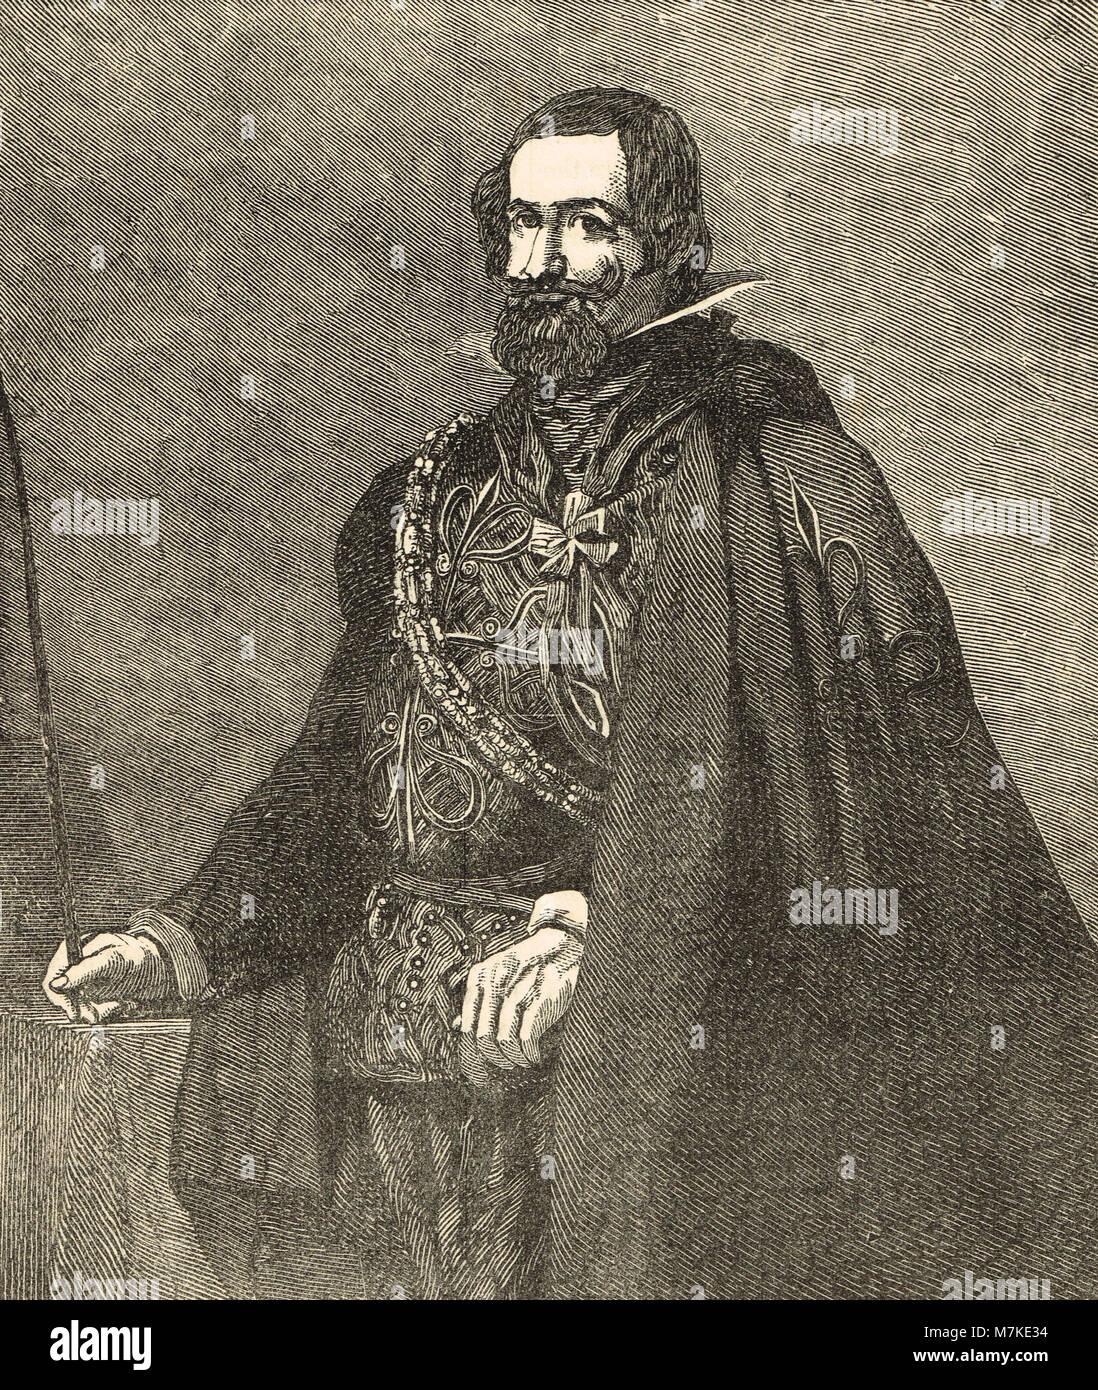 Gaspar de Guzmán, Count-Duke of Olivares - Stock Image